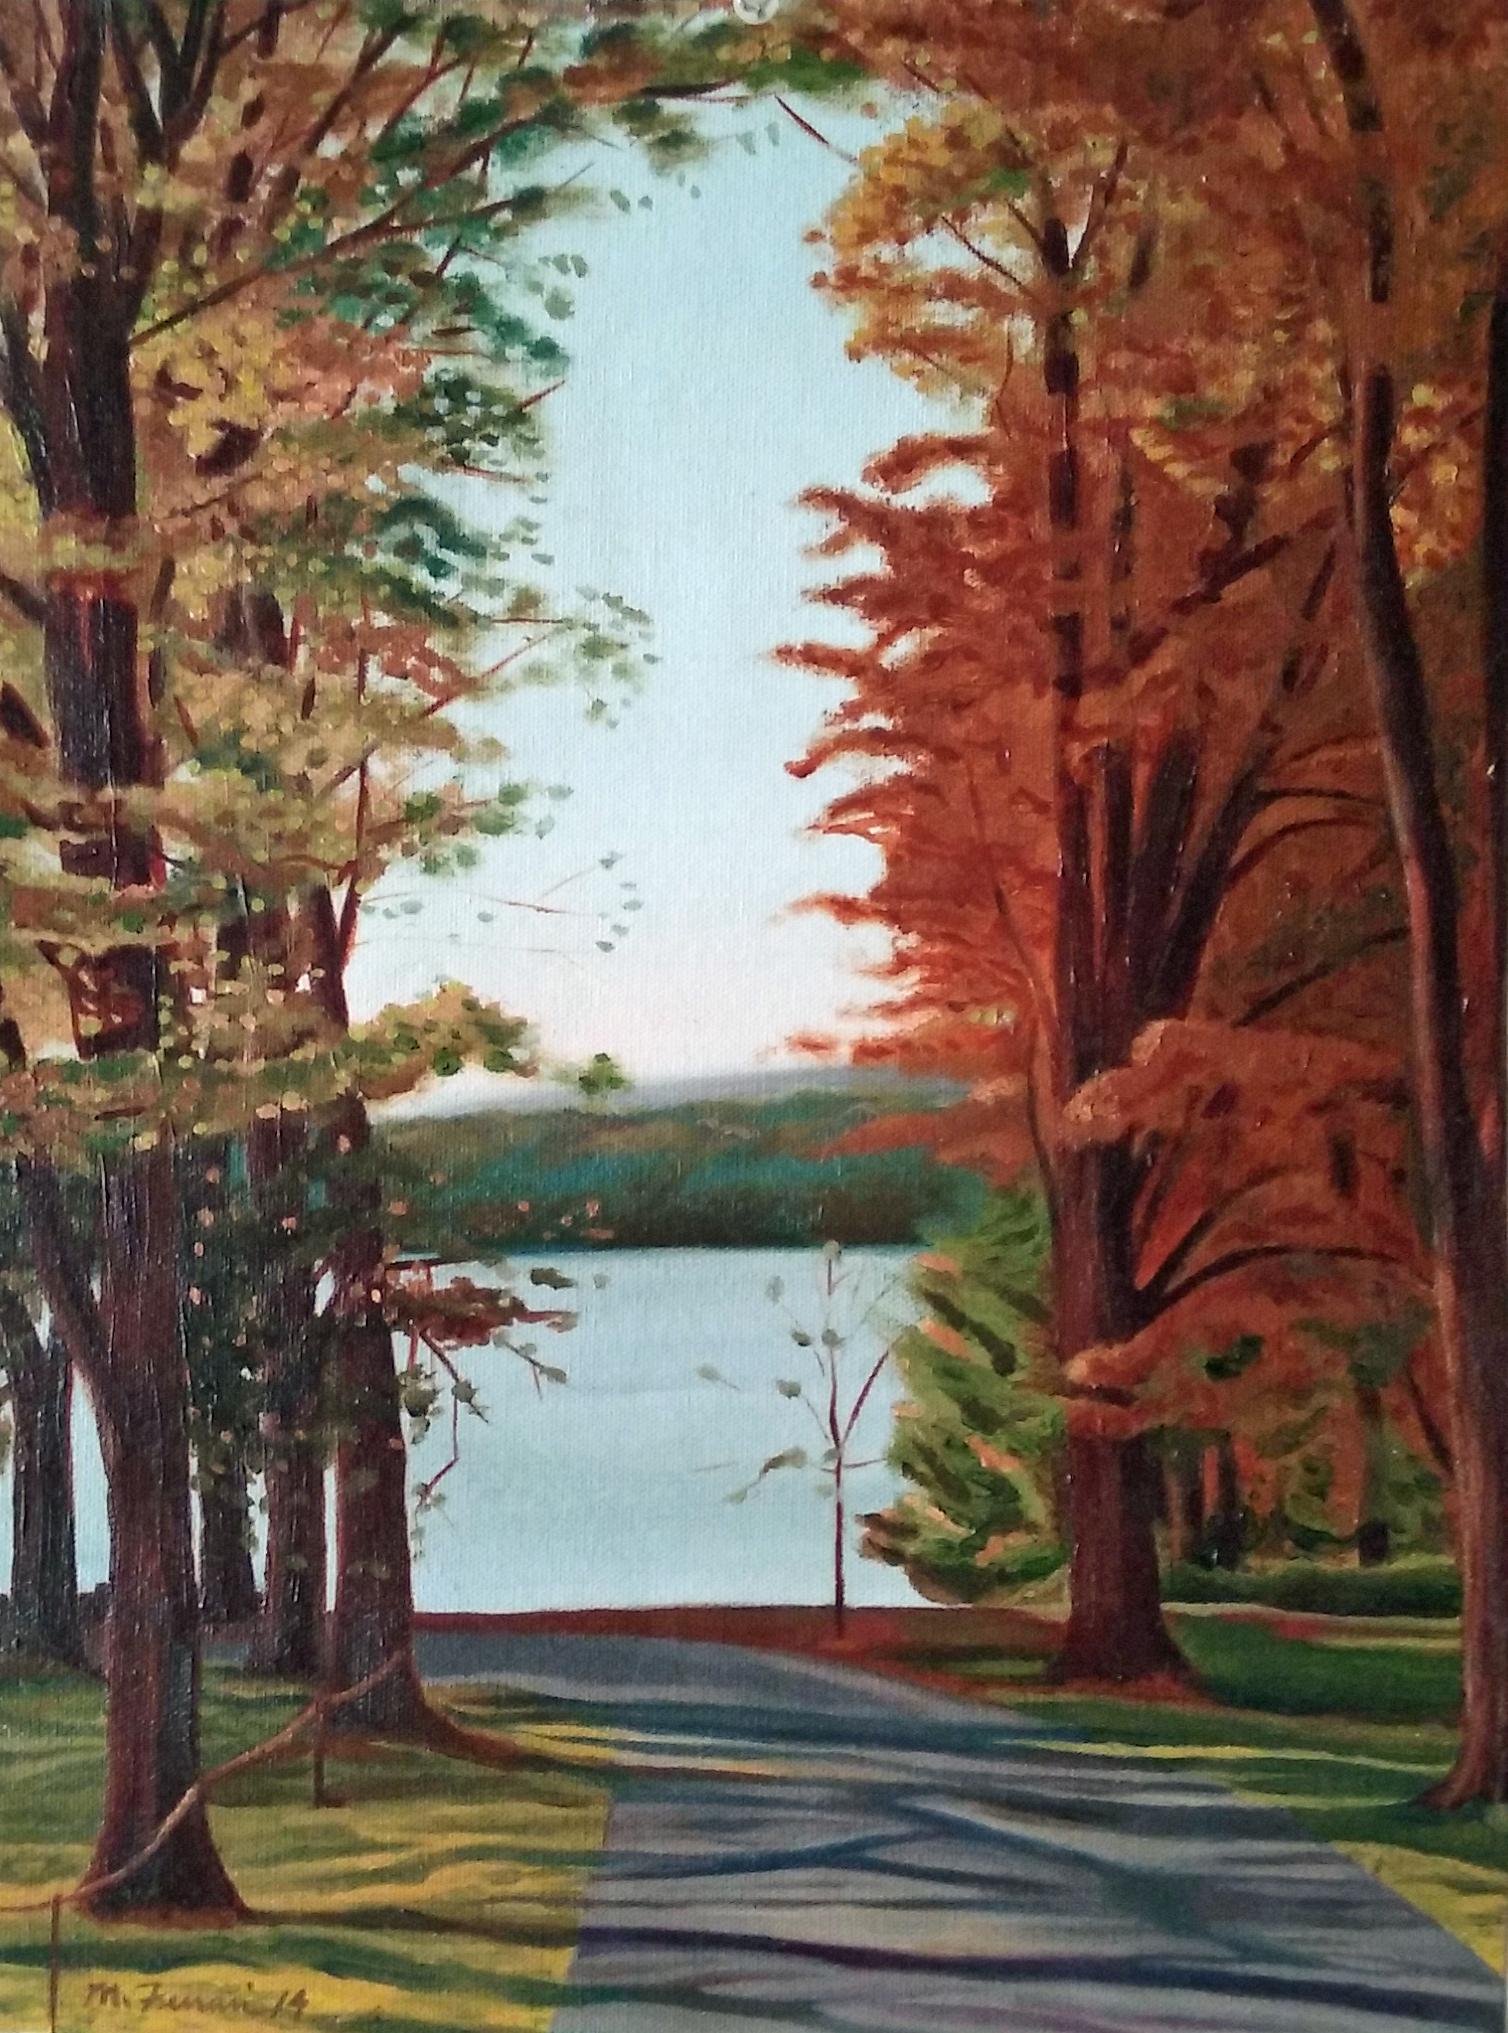 Michael Ferrari FDR Hyde Park painting